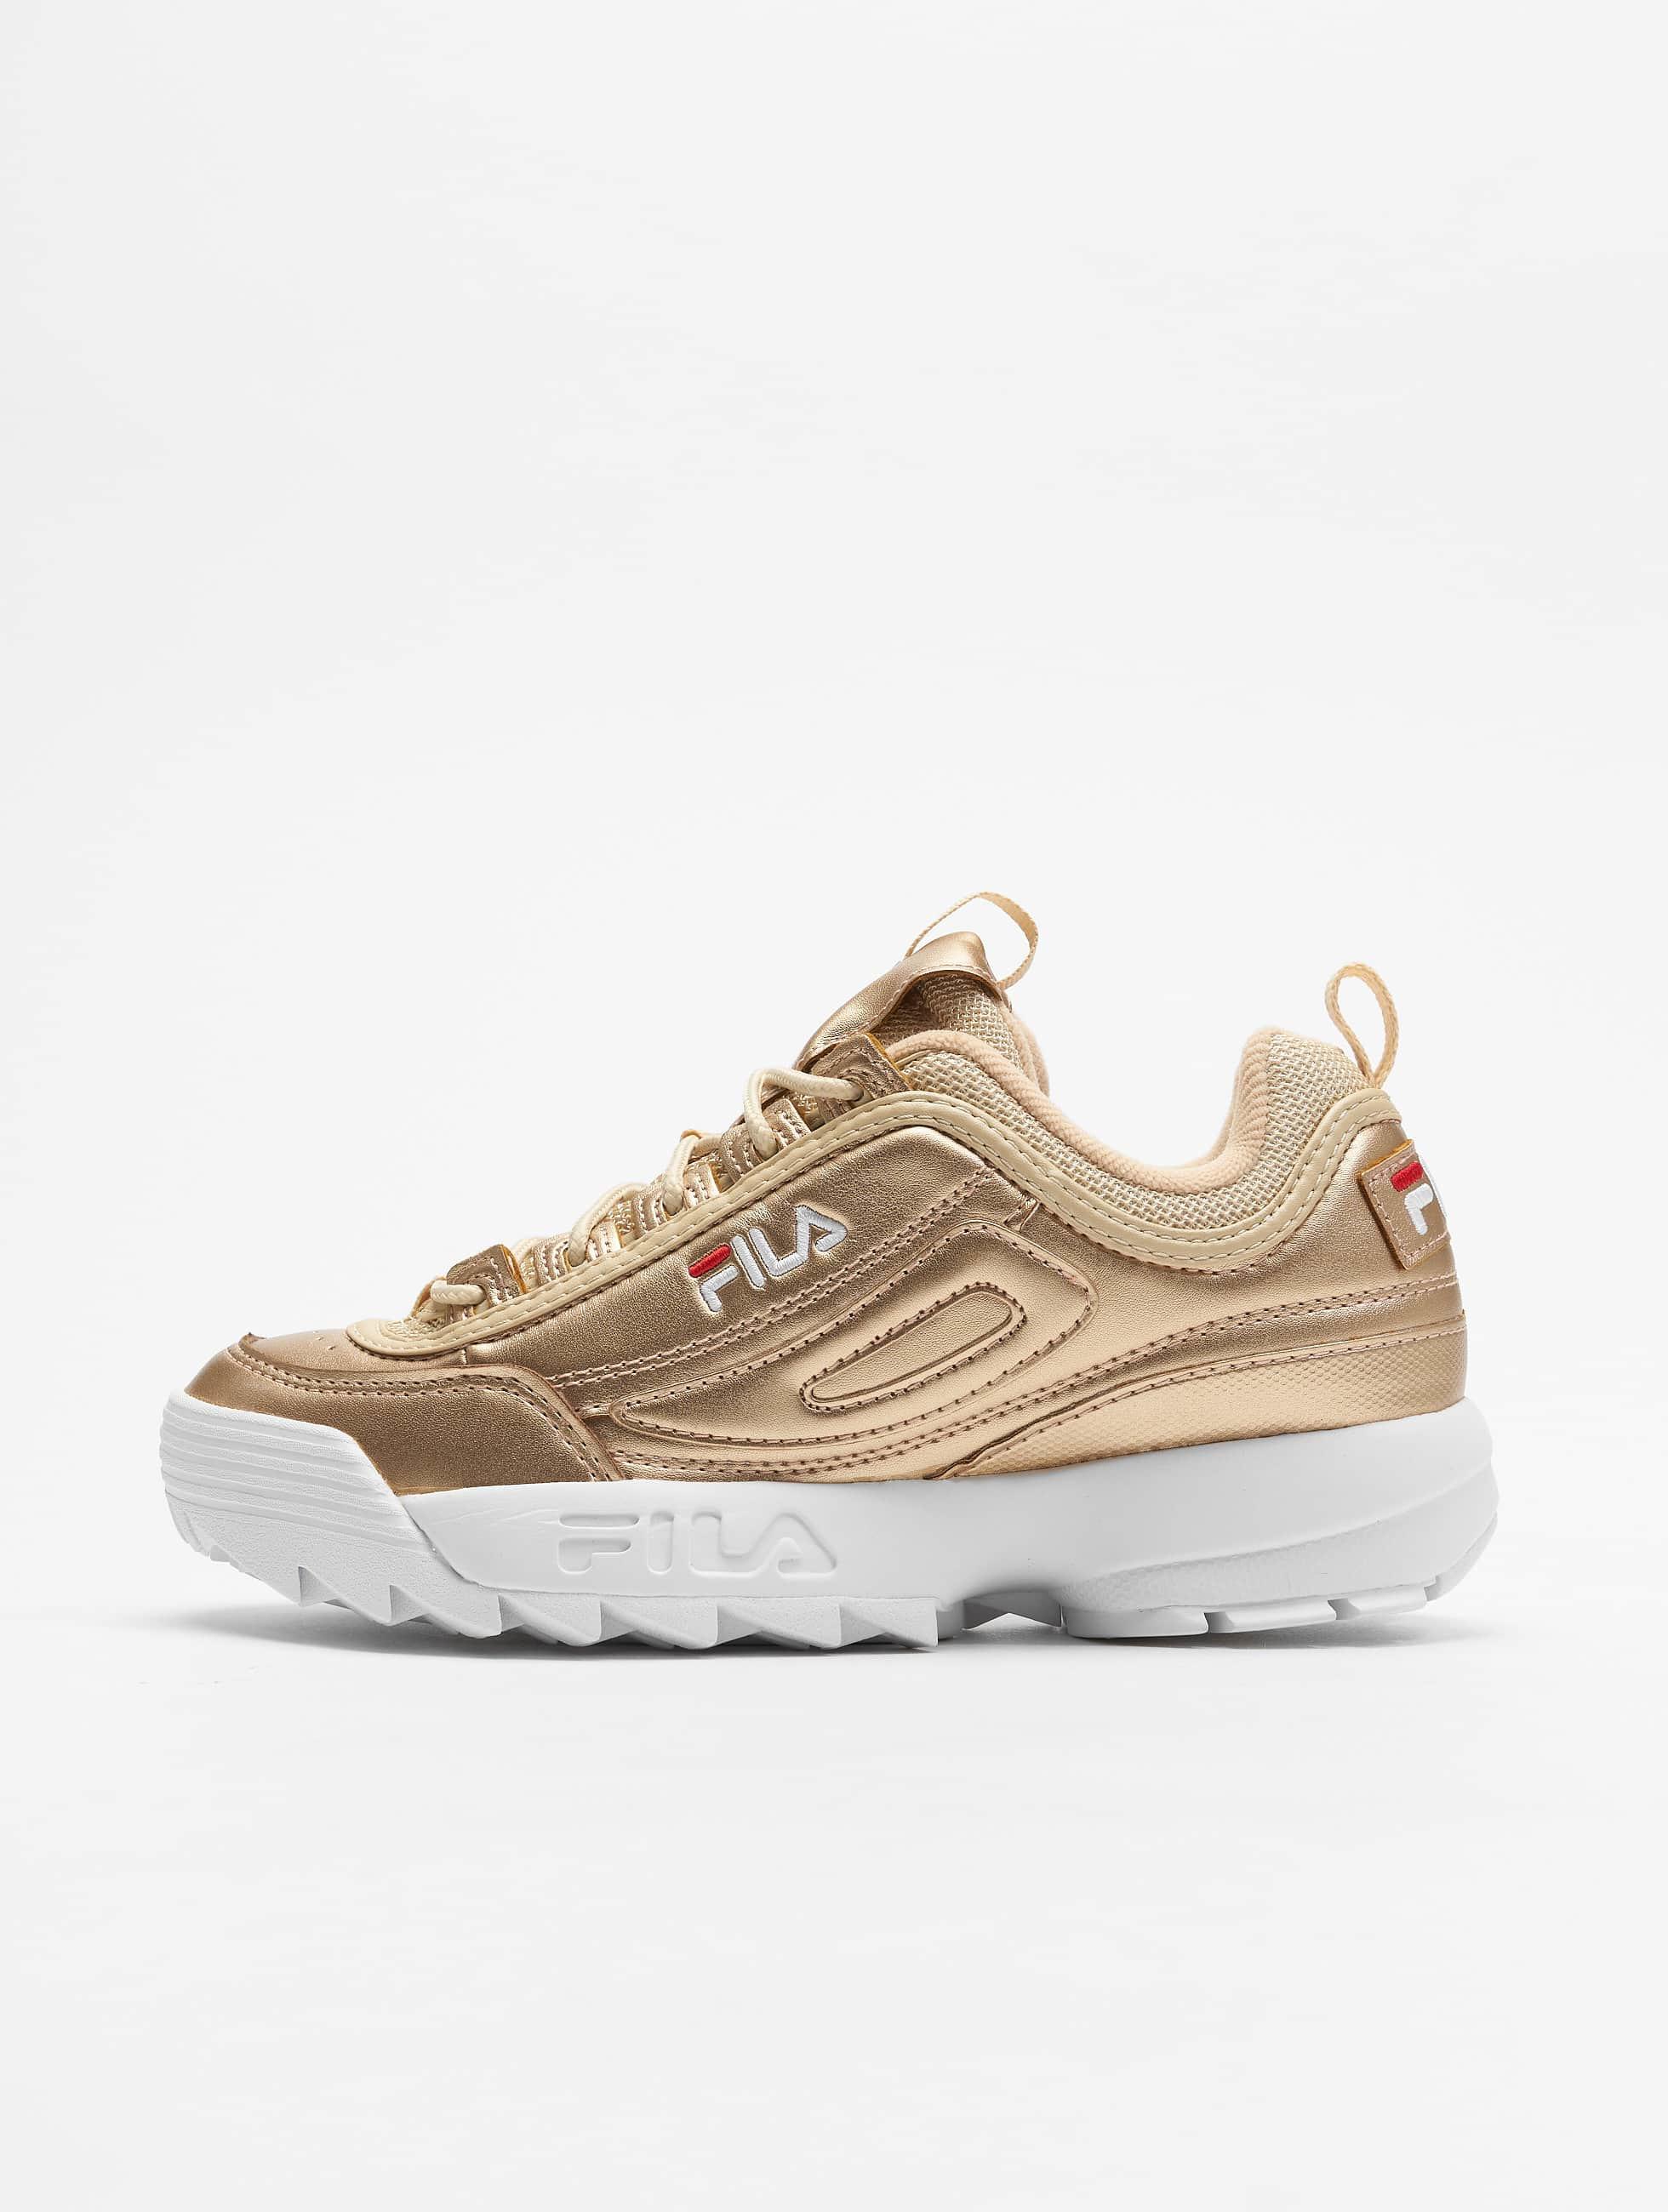 Adidas Stan Smith Guld Lilla til kvinder Cool Sneakers